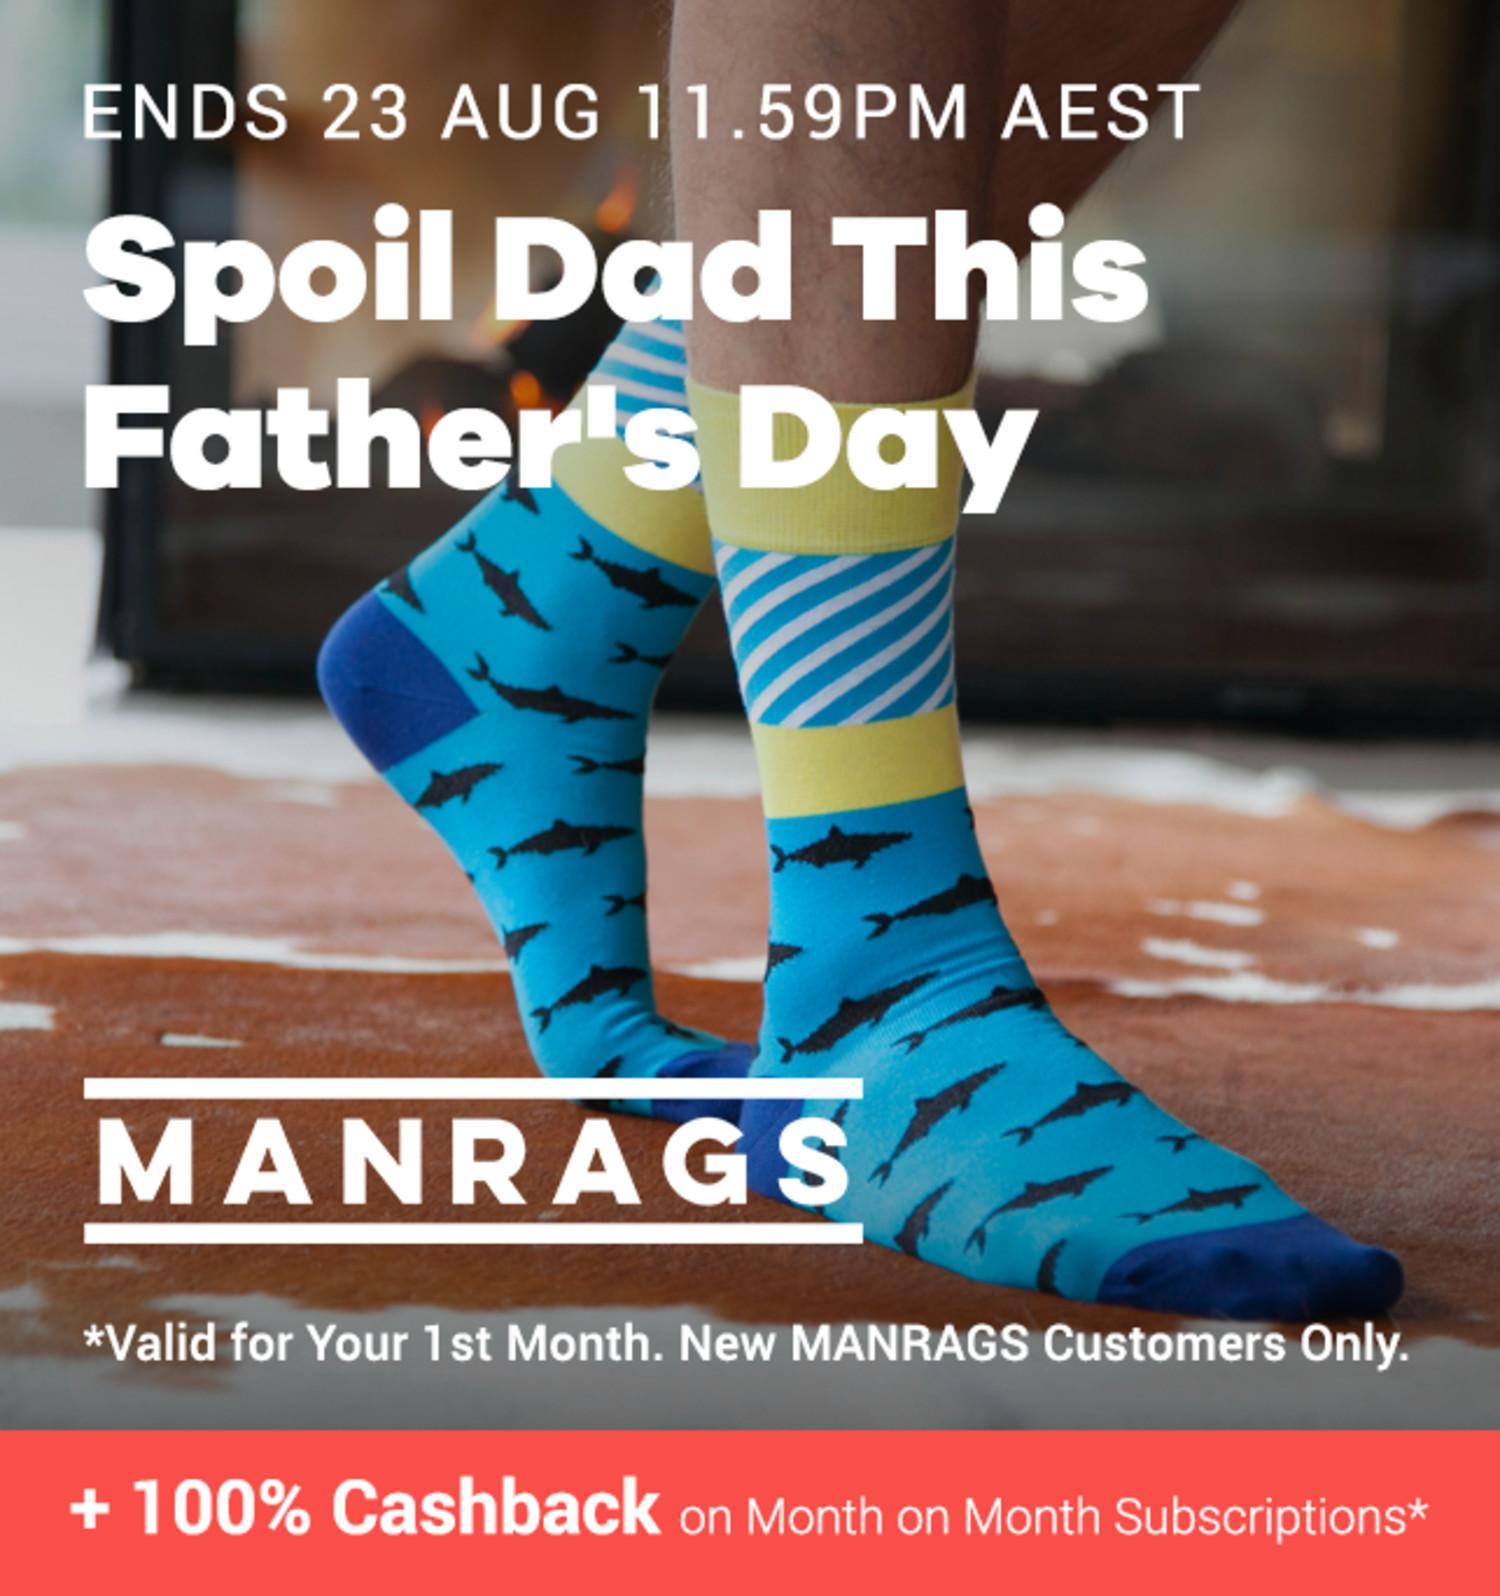 MANRAGS - 100% Cashback